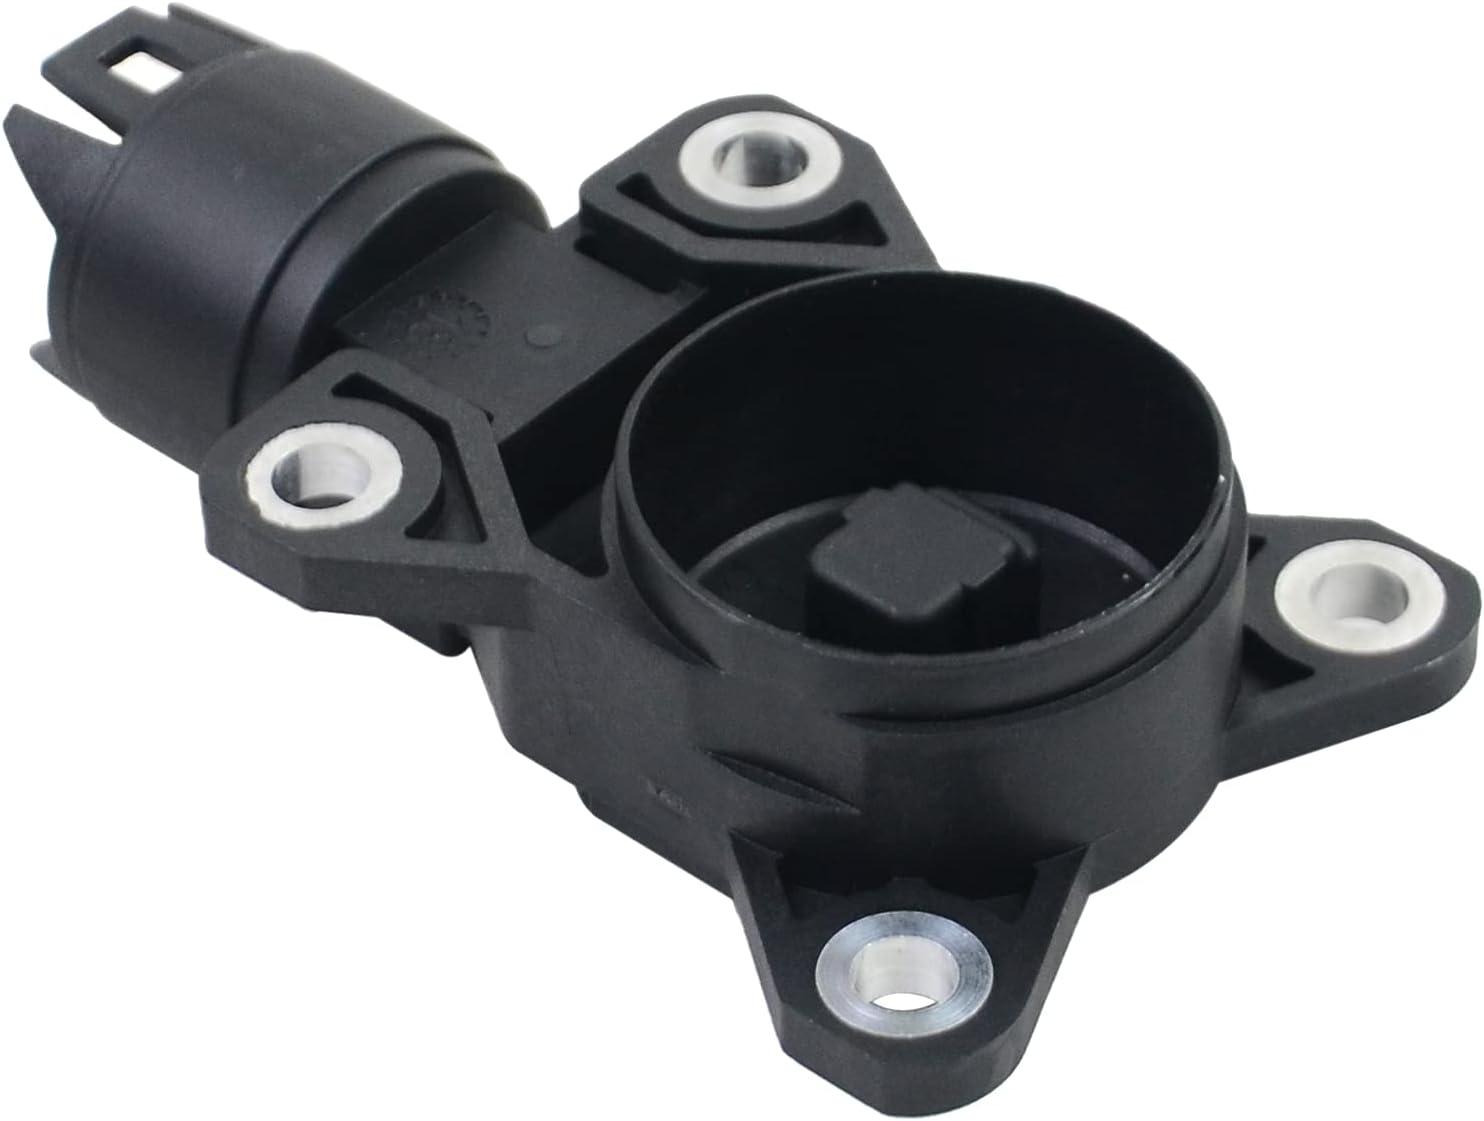 AKWH Eccentric It is very popular Shaft Sensor Part# 11377527017 BM-W E70 for 5 E60 New color